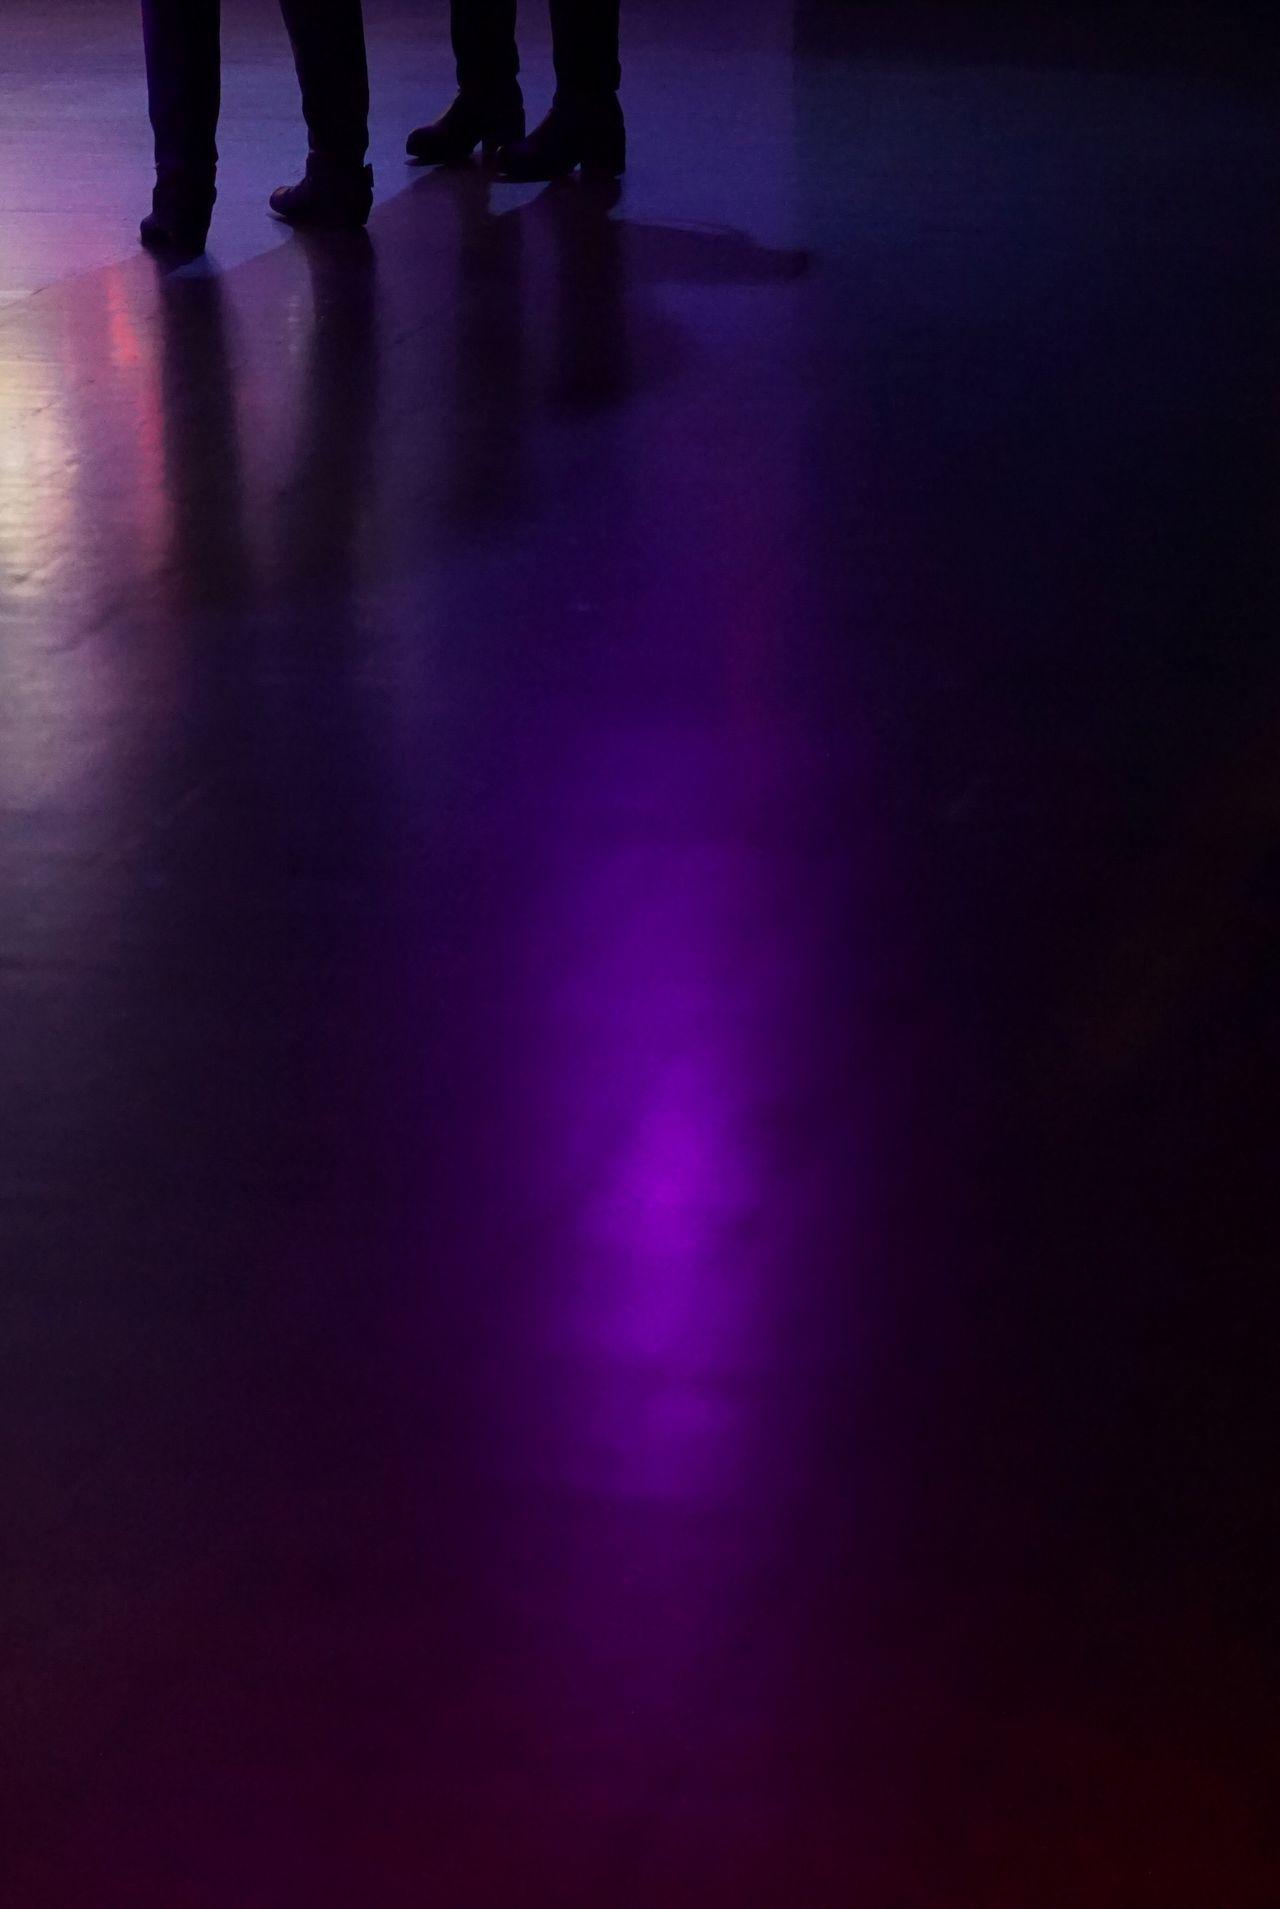 Feet Floor Floortraits Shadows Purple Darkness Colors Minimalism SWEDISH EMBASSY The Weekend On EyeEm In The Crowd Urban Photography House Of Sweden